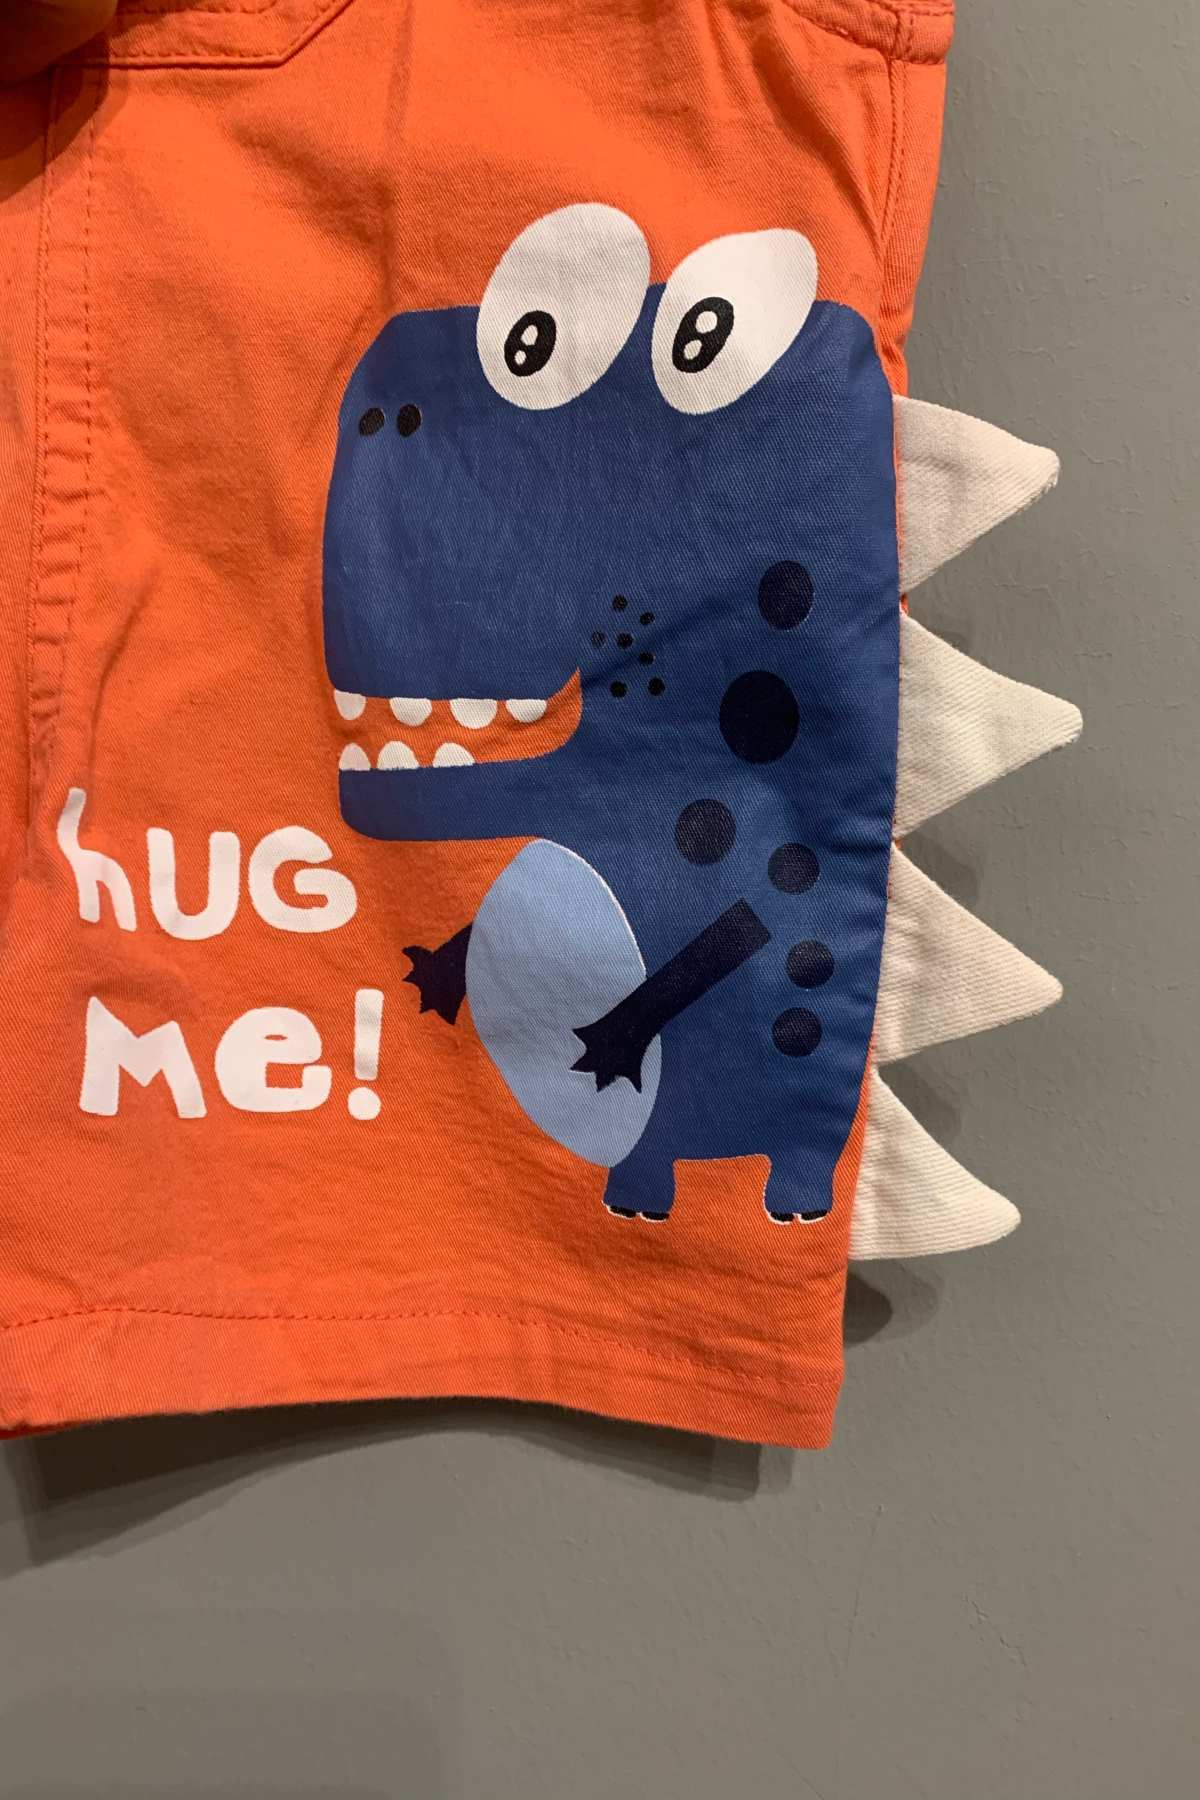 Hug Me Turuncu Salopet Takım